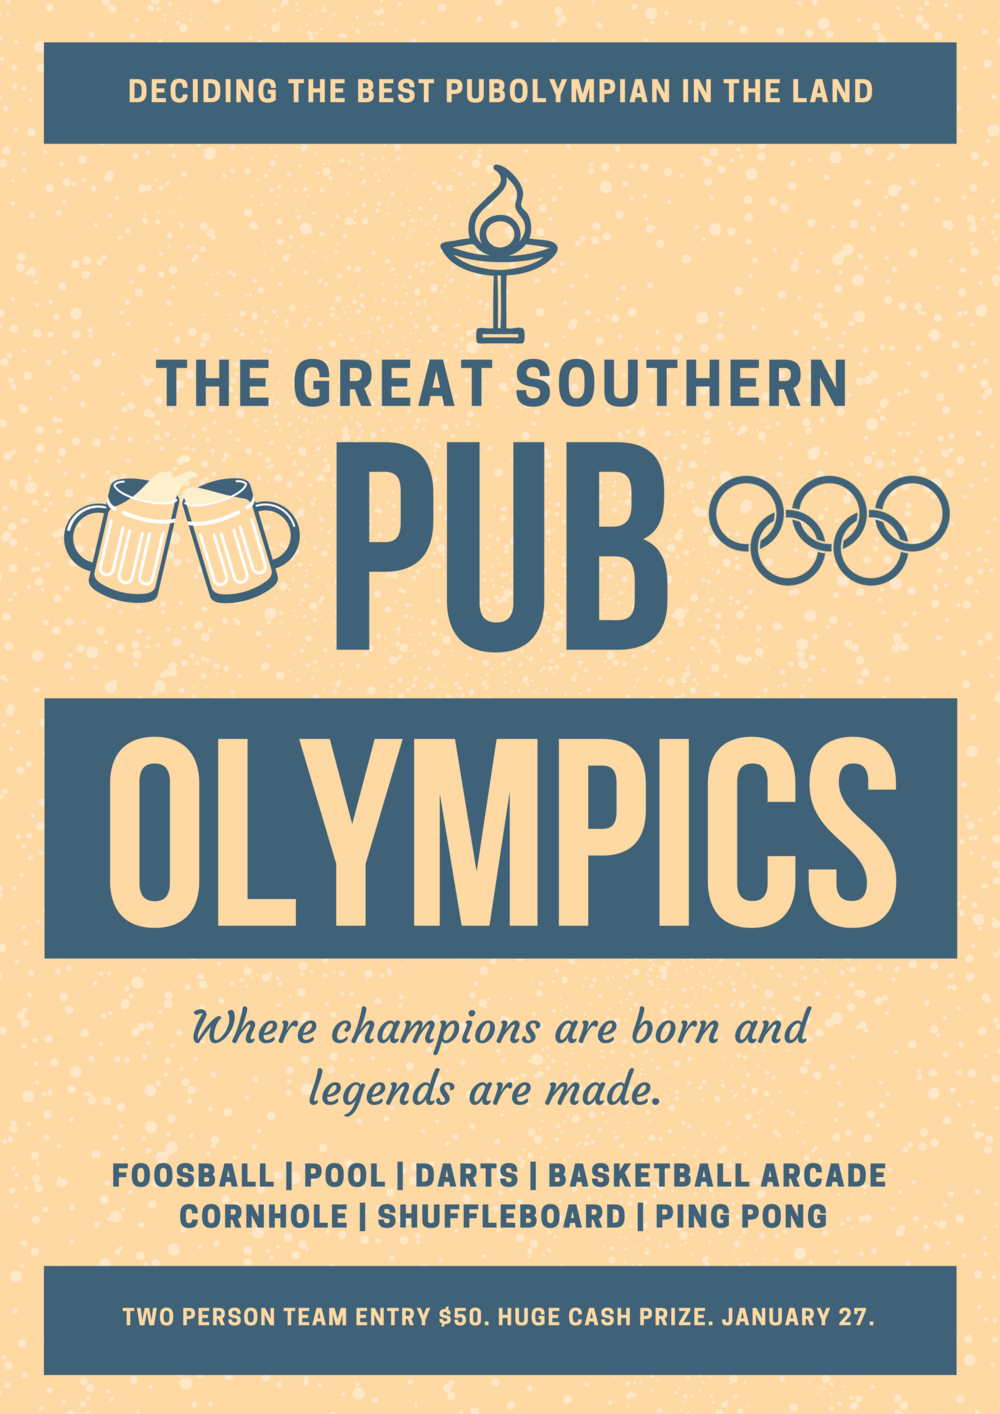 Pub Olympics-2.png